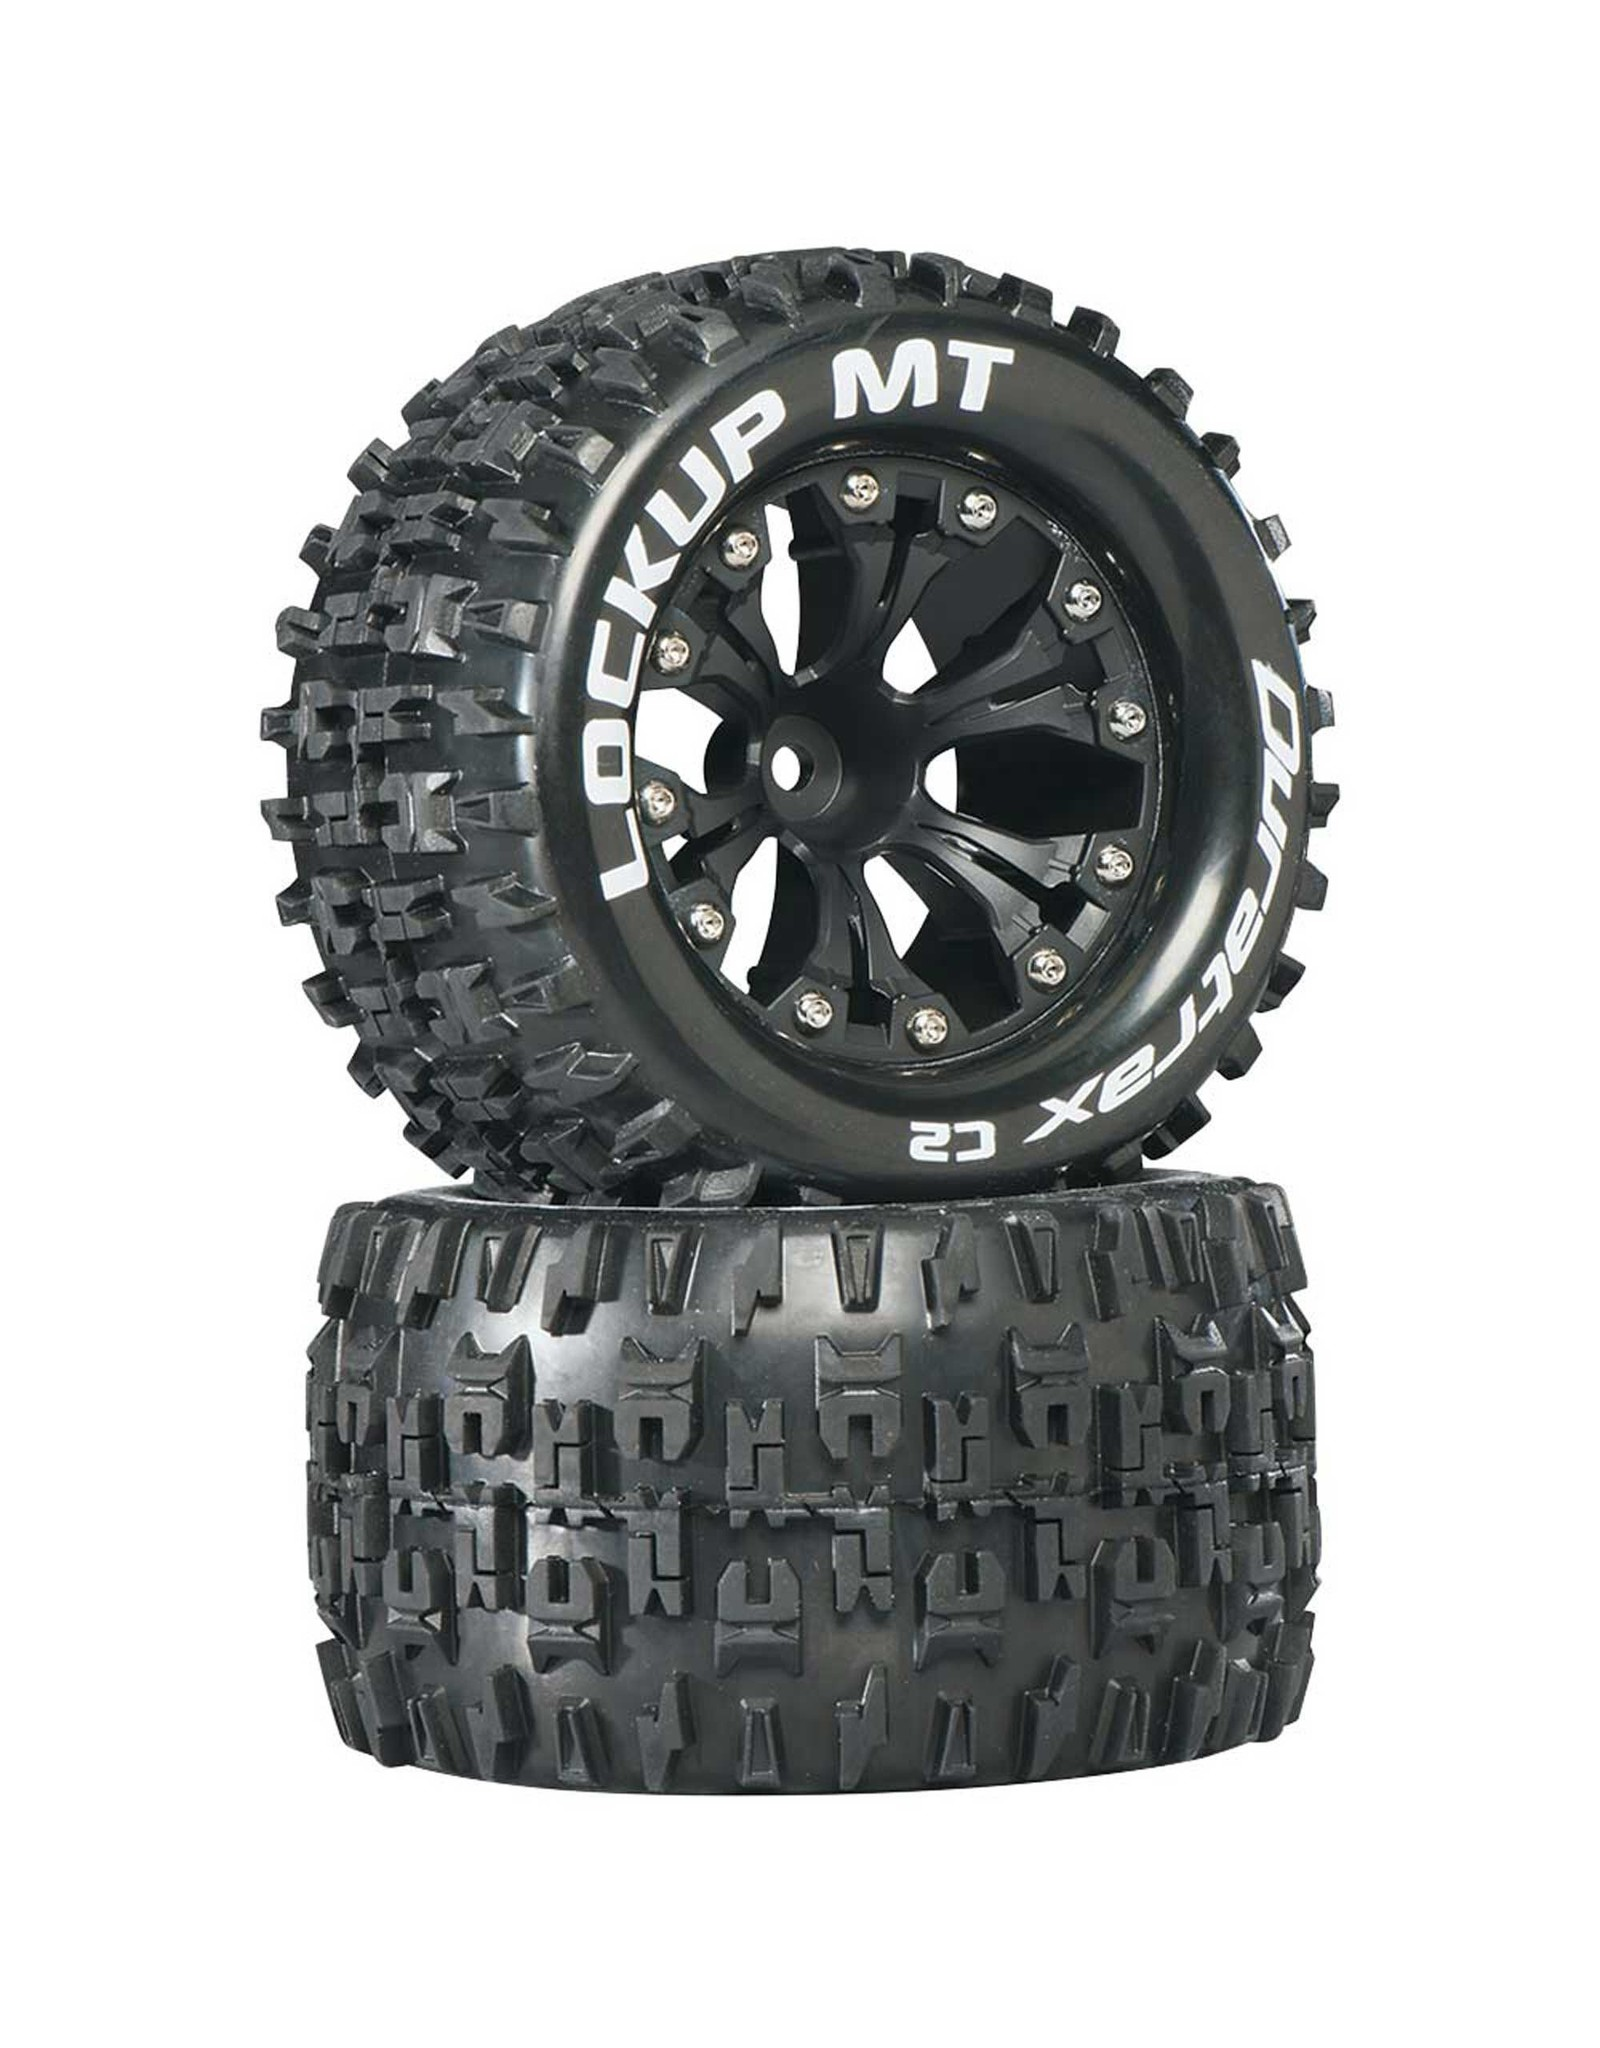 "Duratrax DTXC3510 - Lockup MT 2.8"" 2WD Mounted 1/2"" Offset Tires - Black"